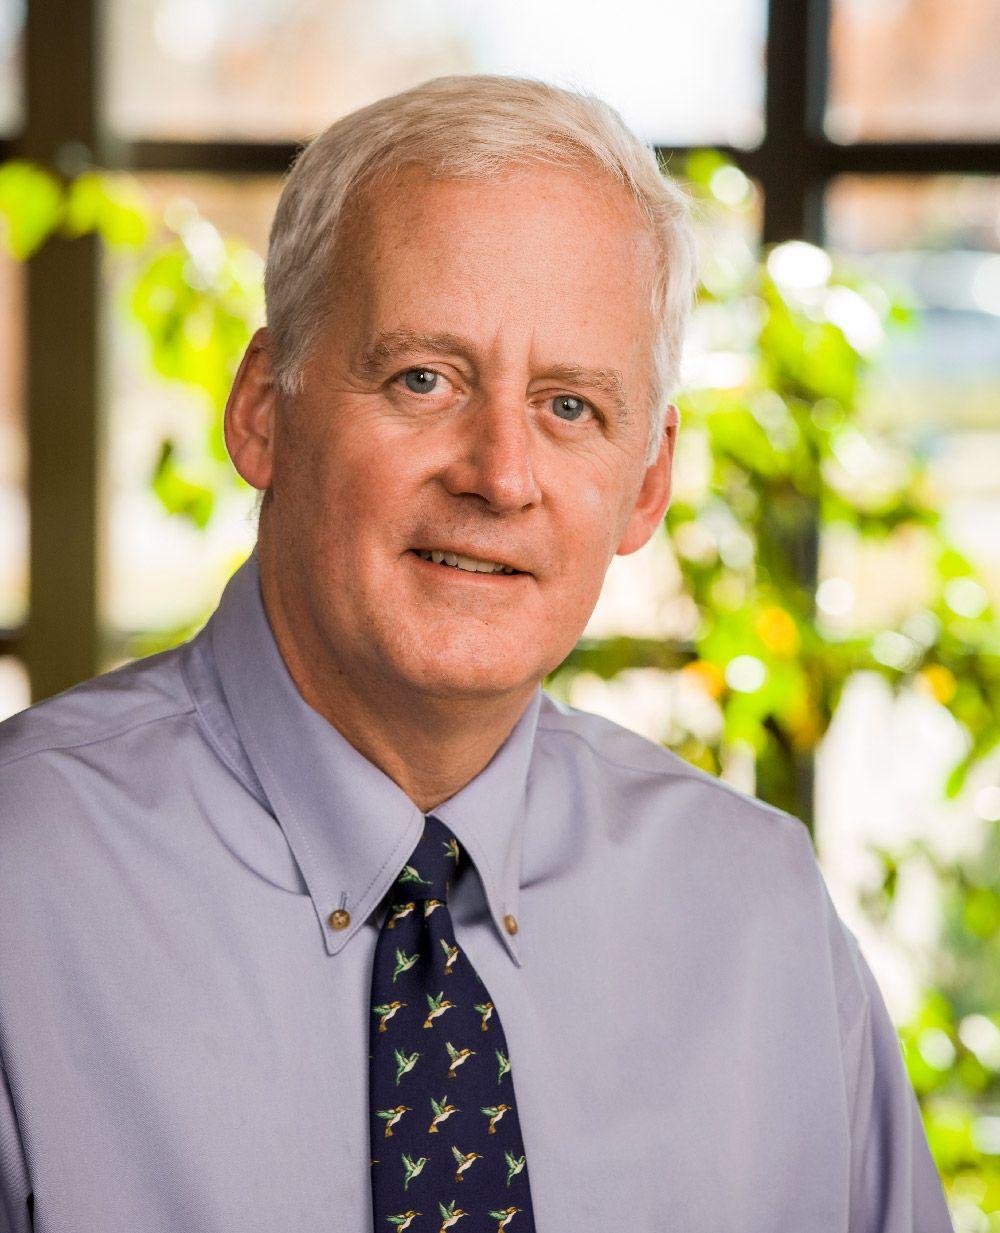 Plastic surgeon Stephen P. Hardy, MD of Northwest Plastic Surgery Associates | Missoula, MT